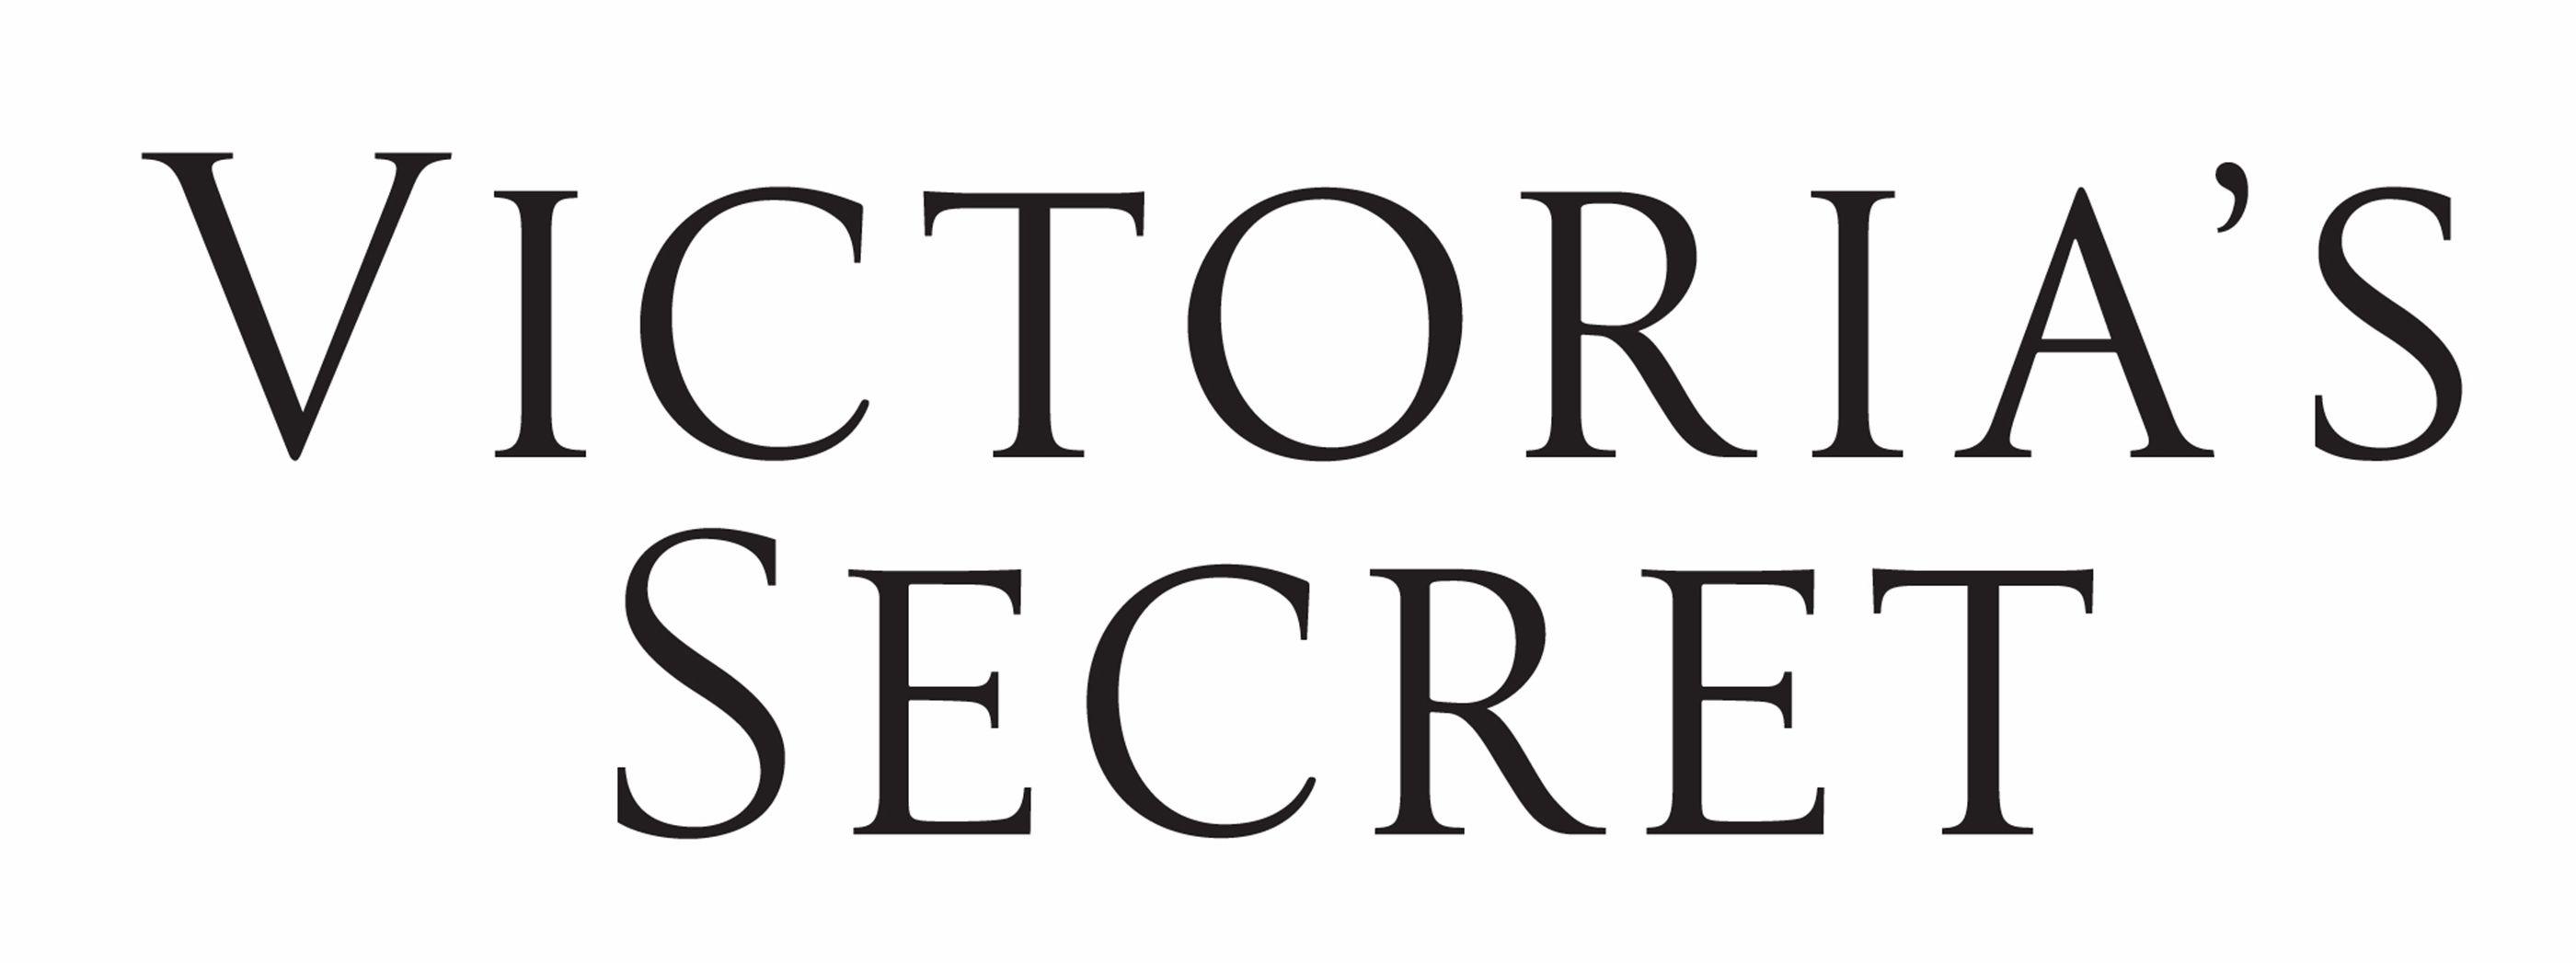 05902a8267 Victoria s Secret Angel credit card payment. Pay your Victoria s Secret  Angel credit card bill online